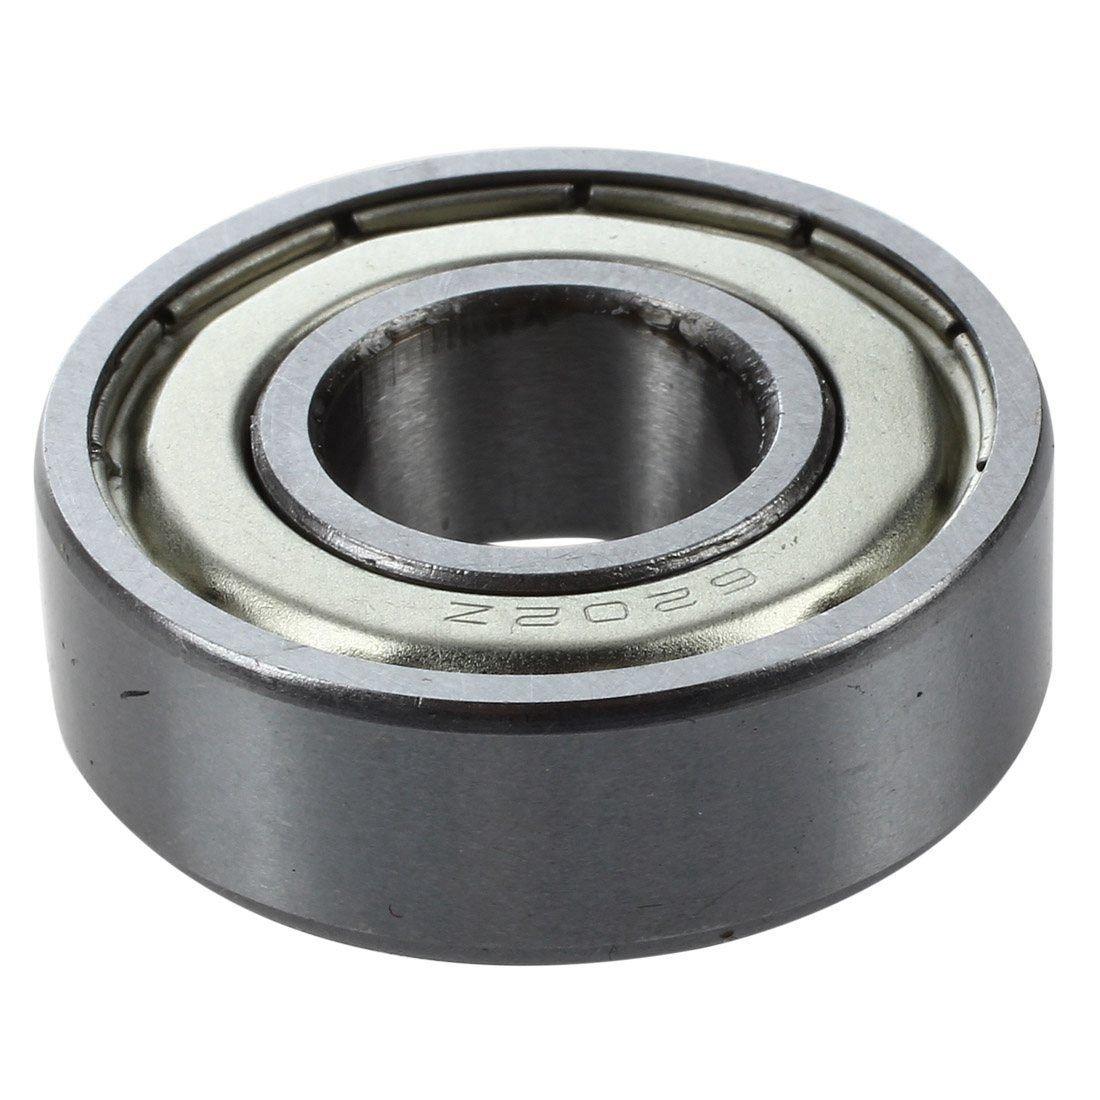 TOOGOO 6202Z Dual Metal Shields Pair Deep Groove Radial Ball Bearing 15 x 35 x 11mm R